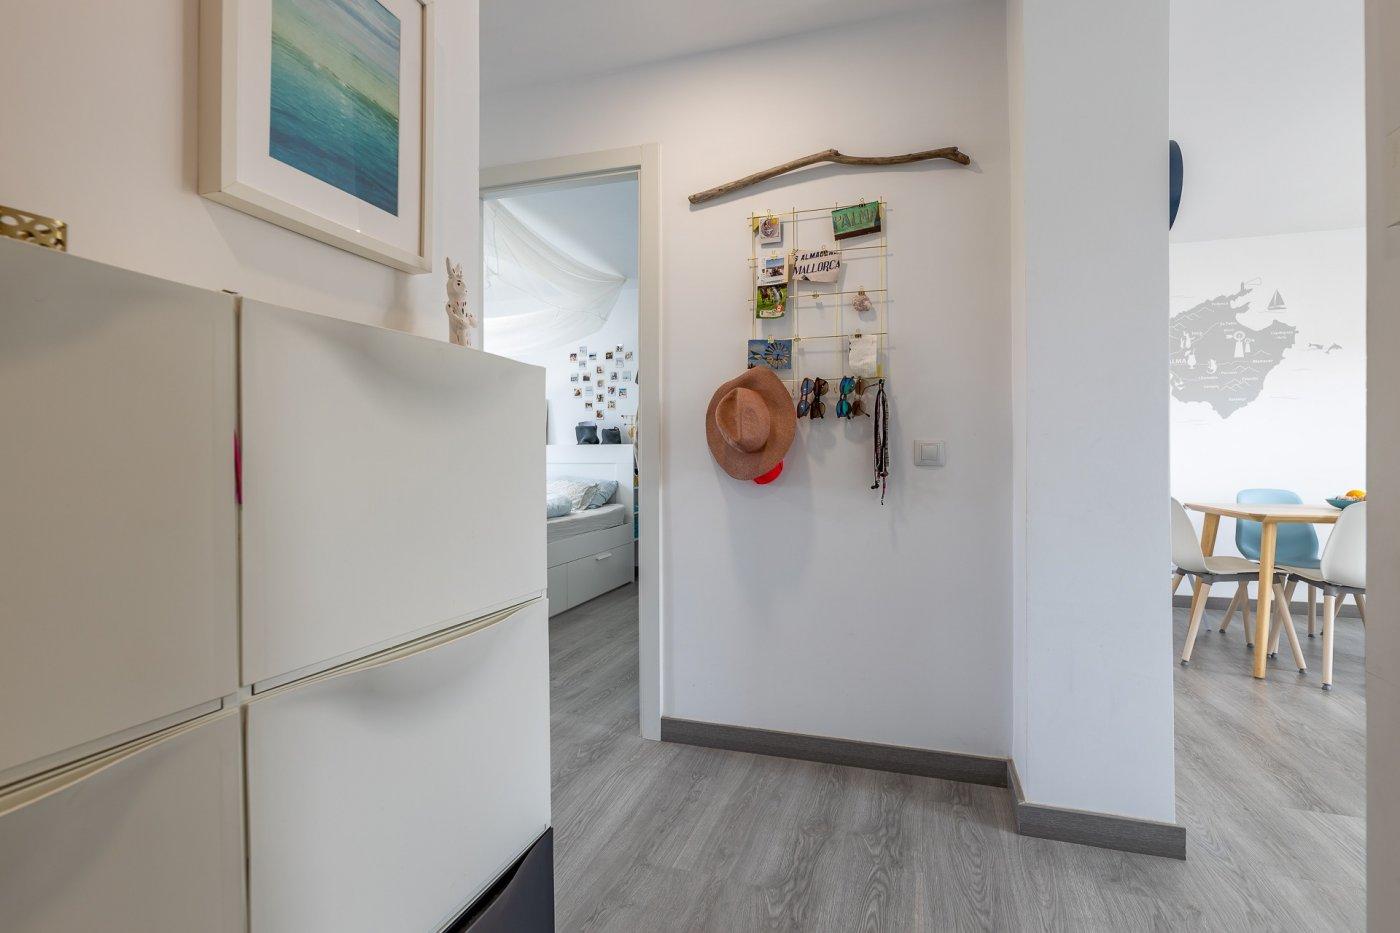 Acogedor piso en zona foners, palma - imagenInmueble10